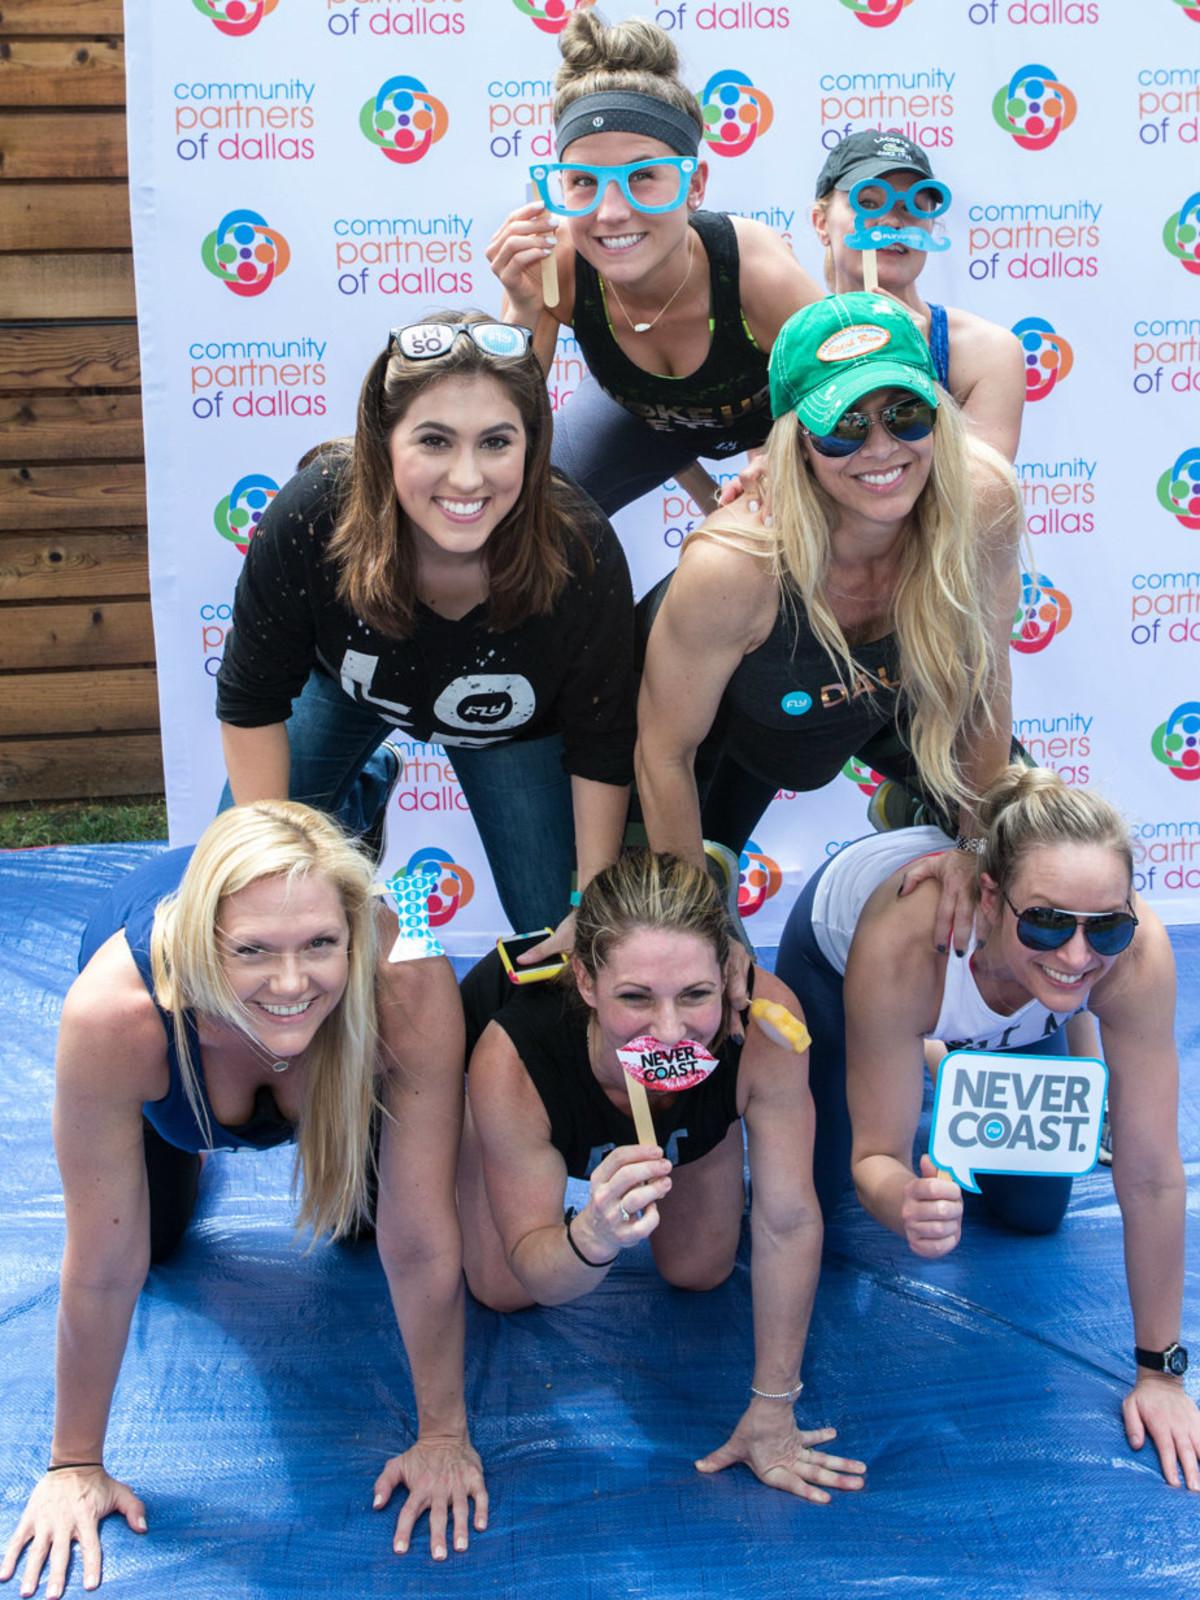 """Team Flywheel Sports"" gaining points at the yCPD social media station:  Top - Chaeley Barber, Missy Quintana; second row - Chelsea Morehart, Kelly Hershman; bottom row: Jolie Laurence, Cristin Caulfield, Mandy Mack"